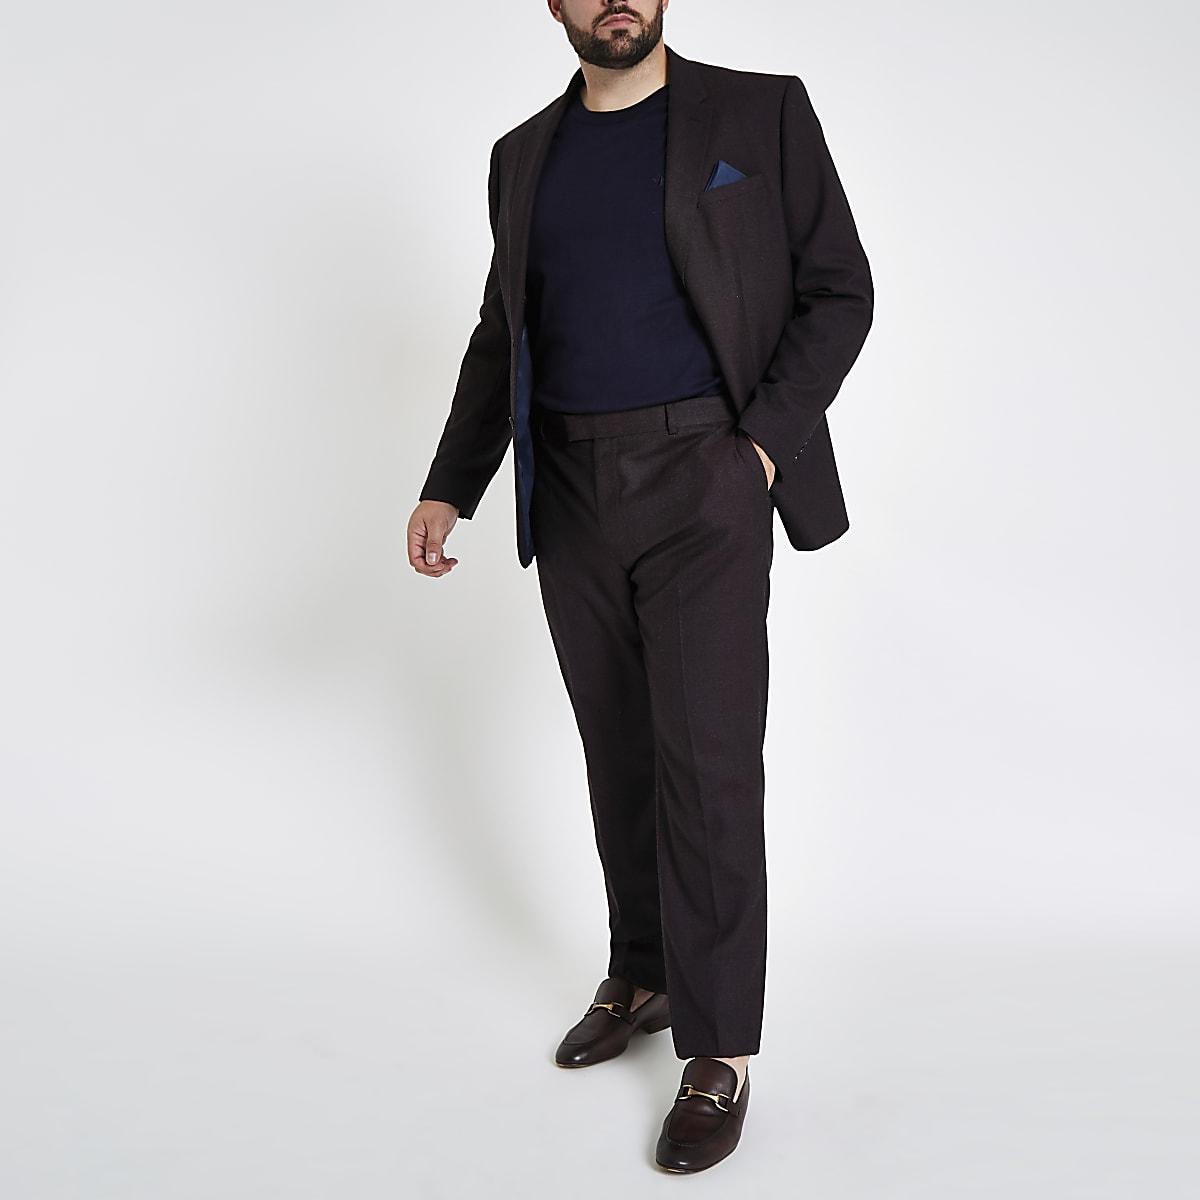 Big and Tall purple suit slim fit jacket